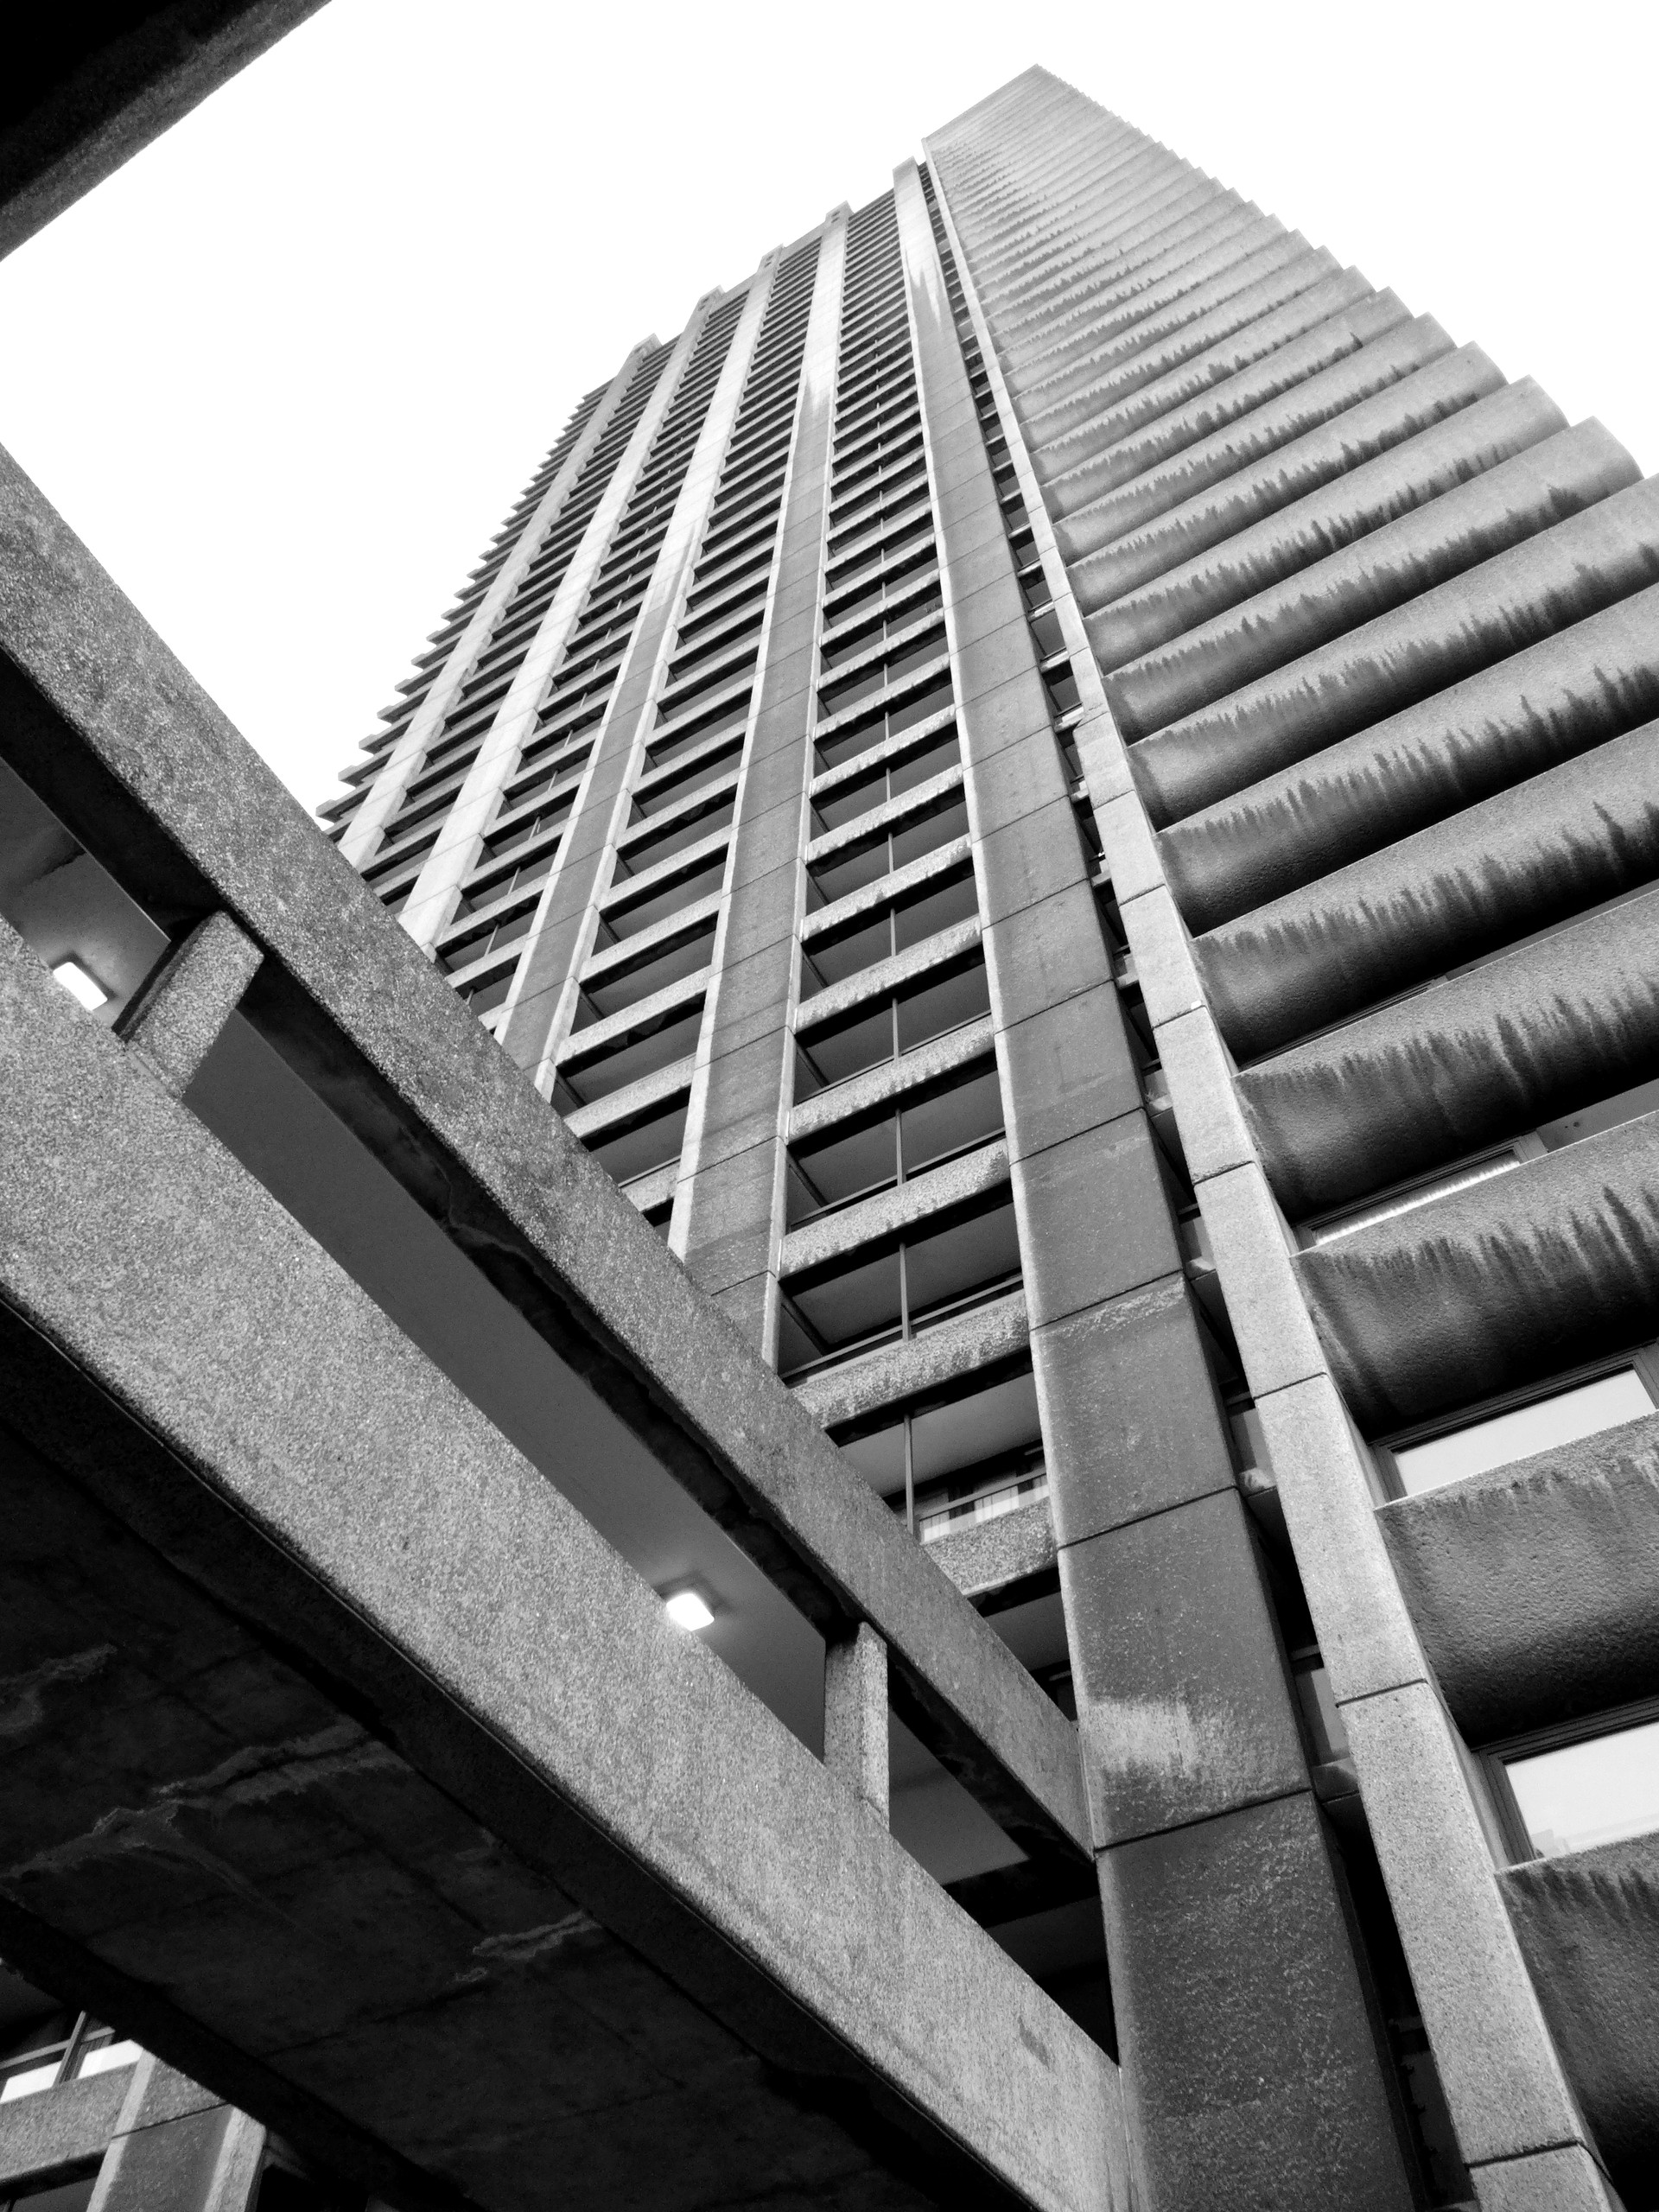 The Barbican, London